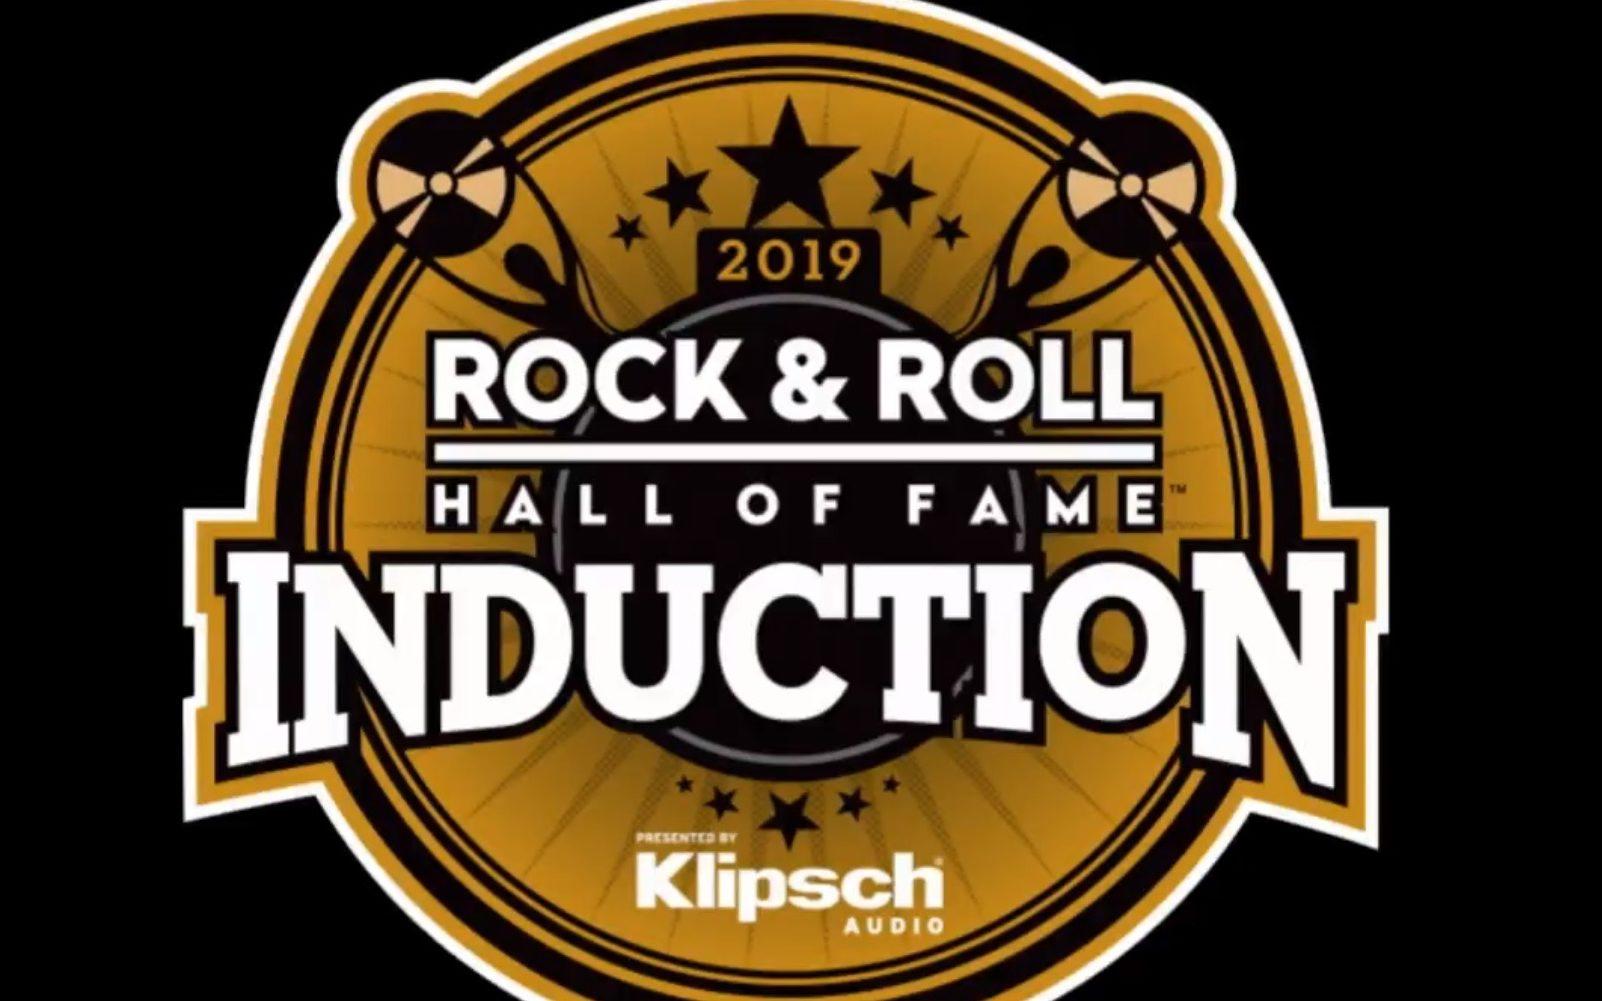 locandina della Rock and roll hall of fame